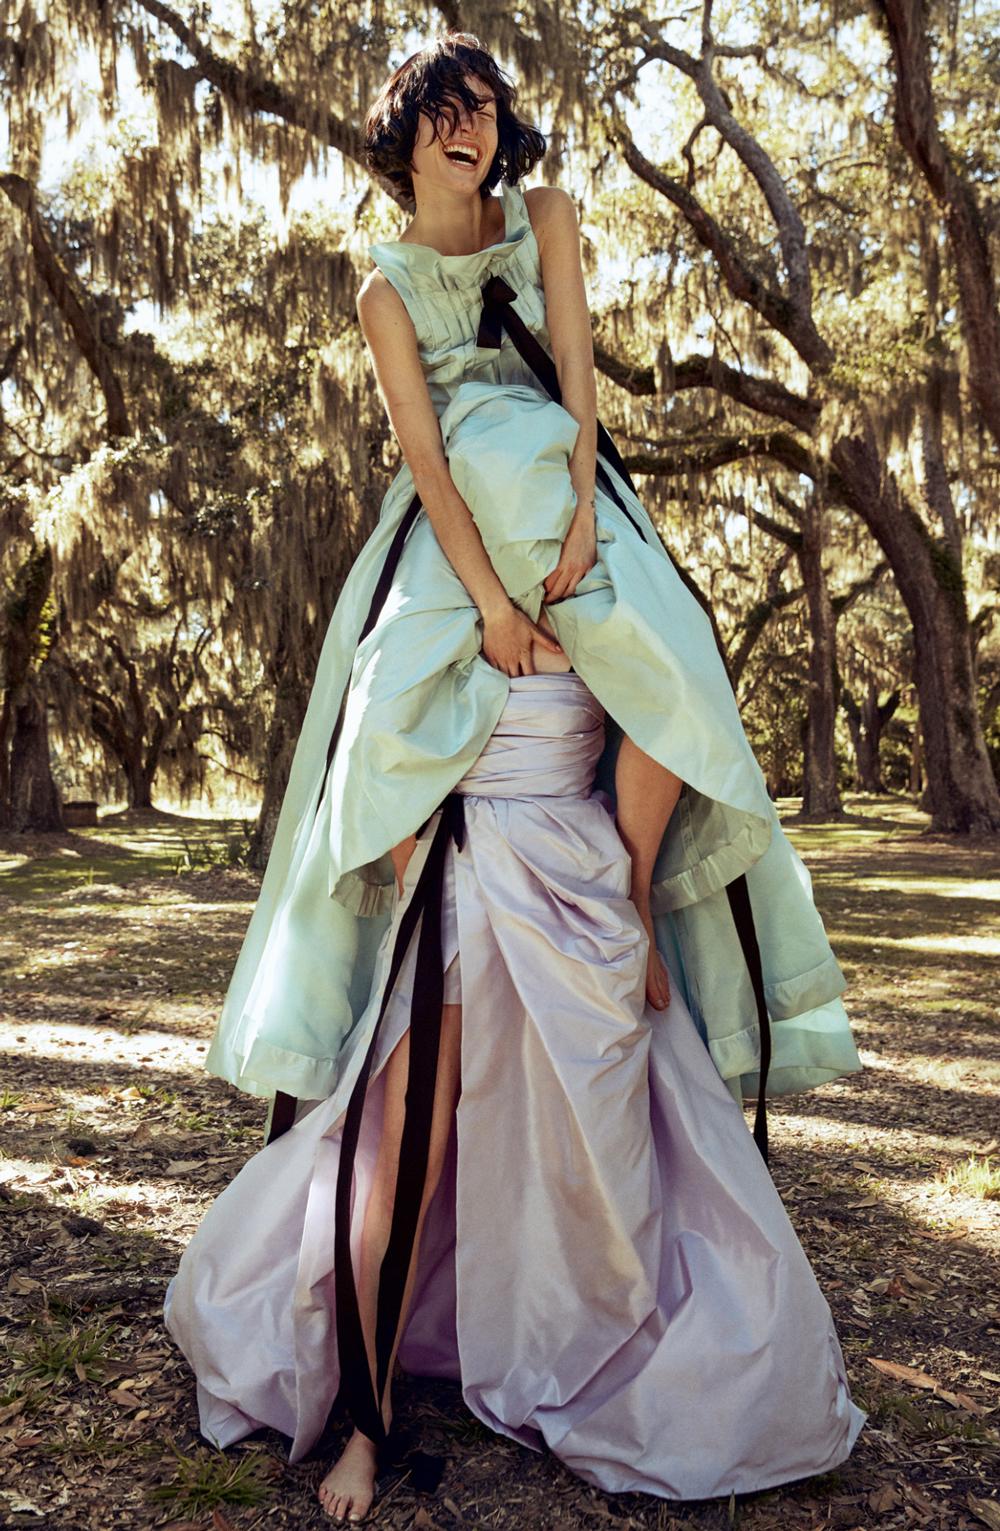 Oscar de la Renta dresses in Porter magazine Spring 2016 (photography: Cass Bird, styling: Alex White)